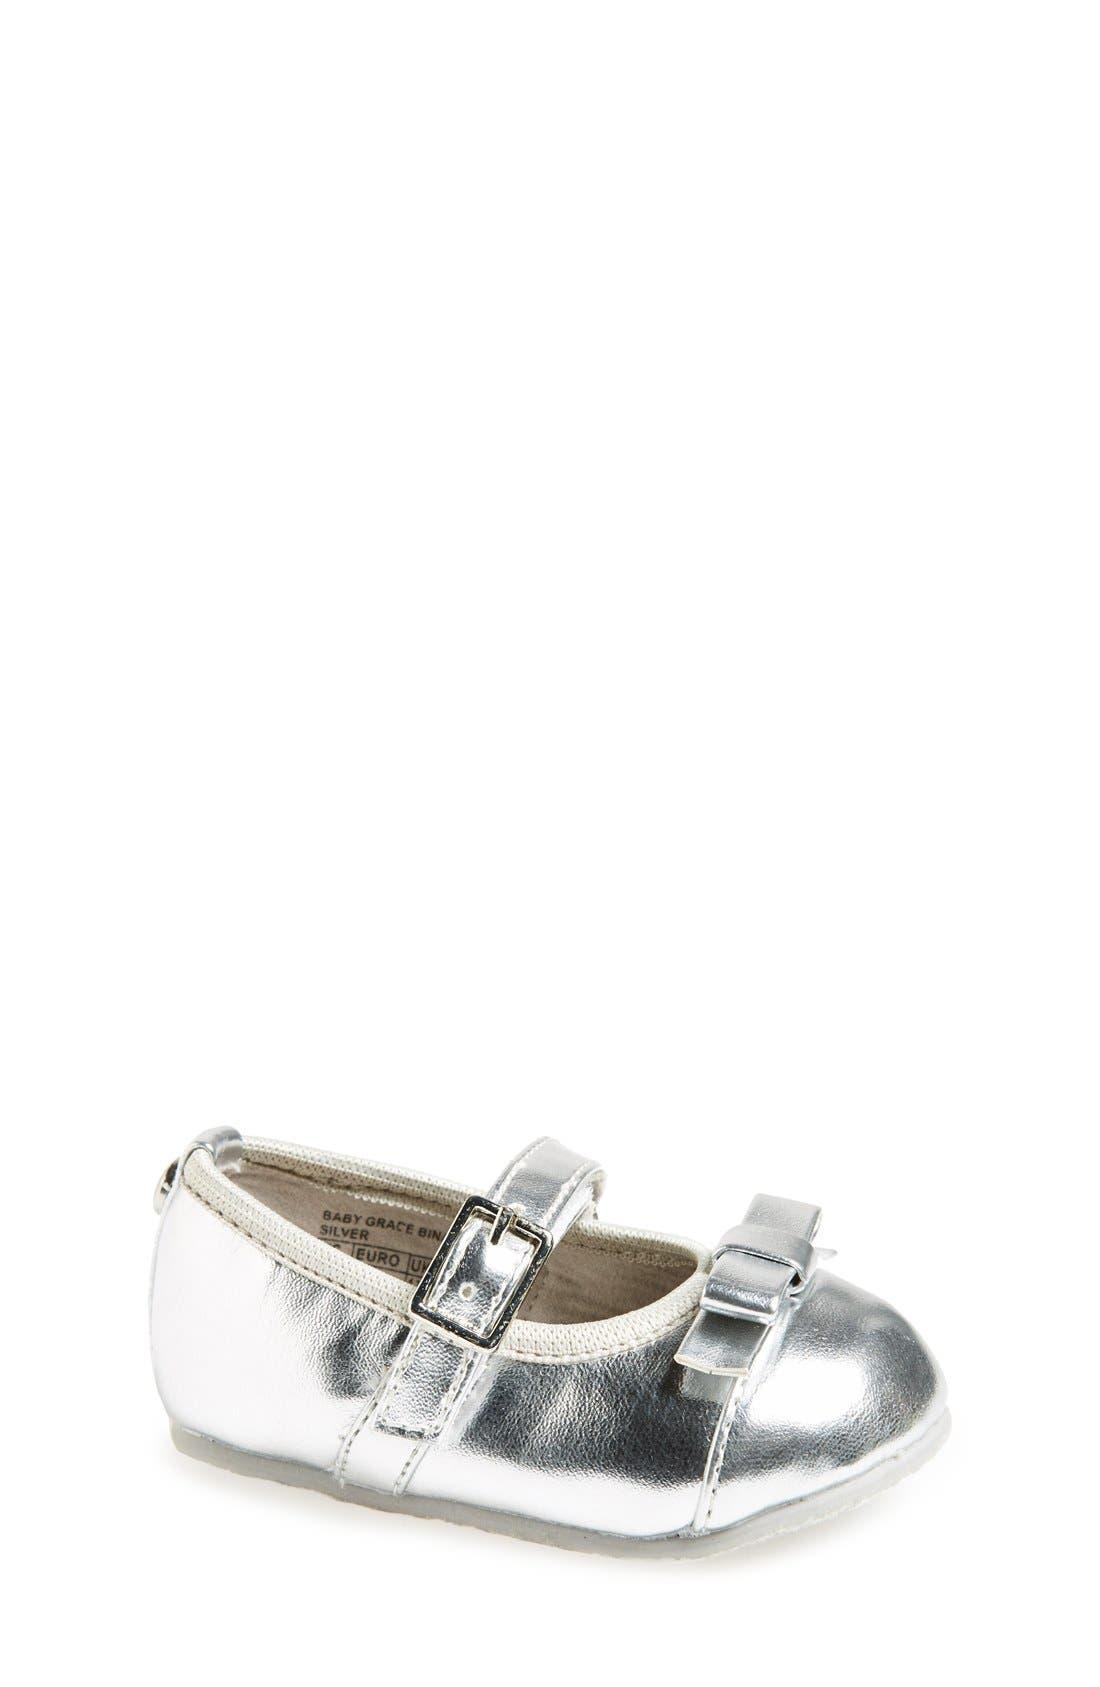 Alternate Image 1 Selected - MICHAEL Michael Kors 'Grace Bina' Mary Jane Crib Shoe (Baby)